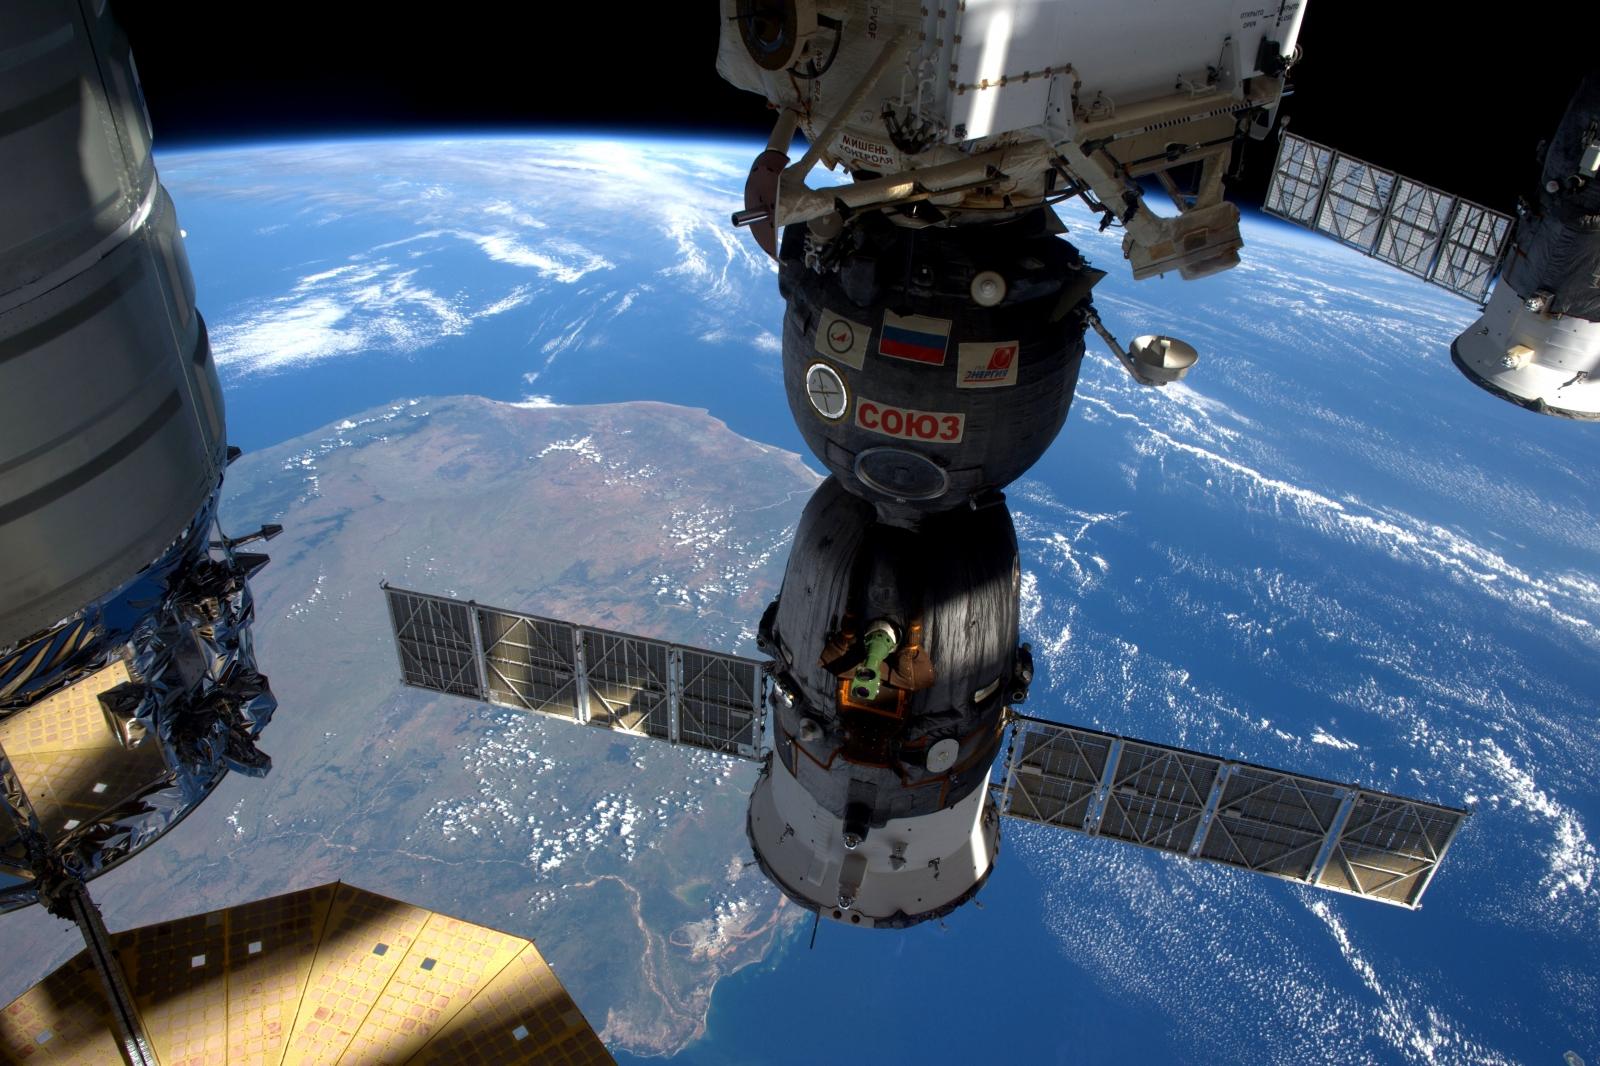 Major Tim's soyuz space capsule to land in the science museum